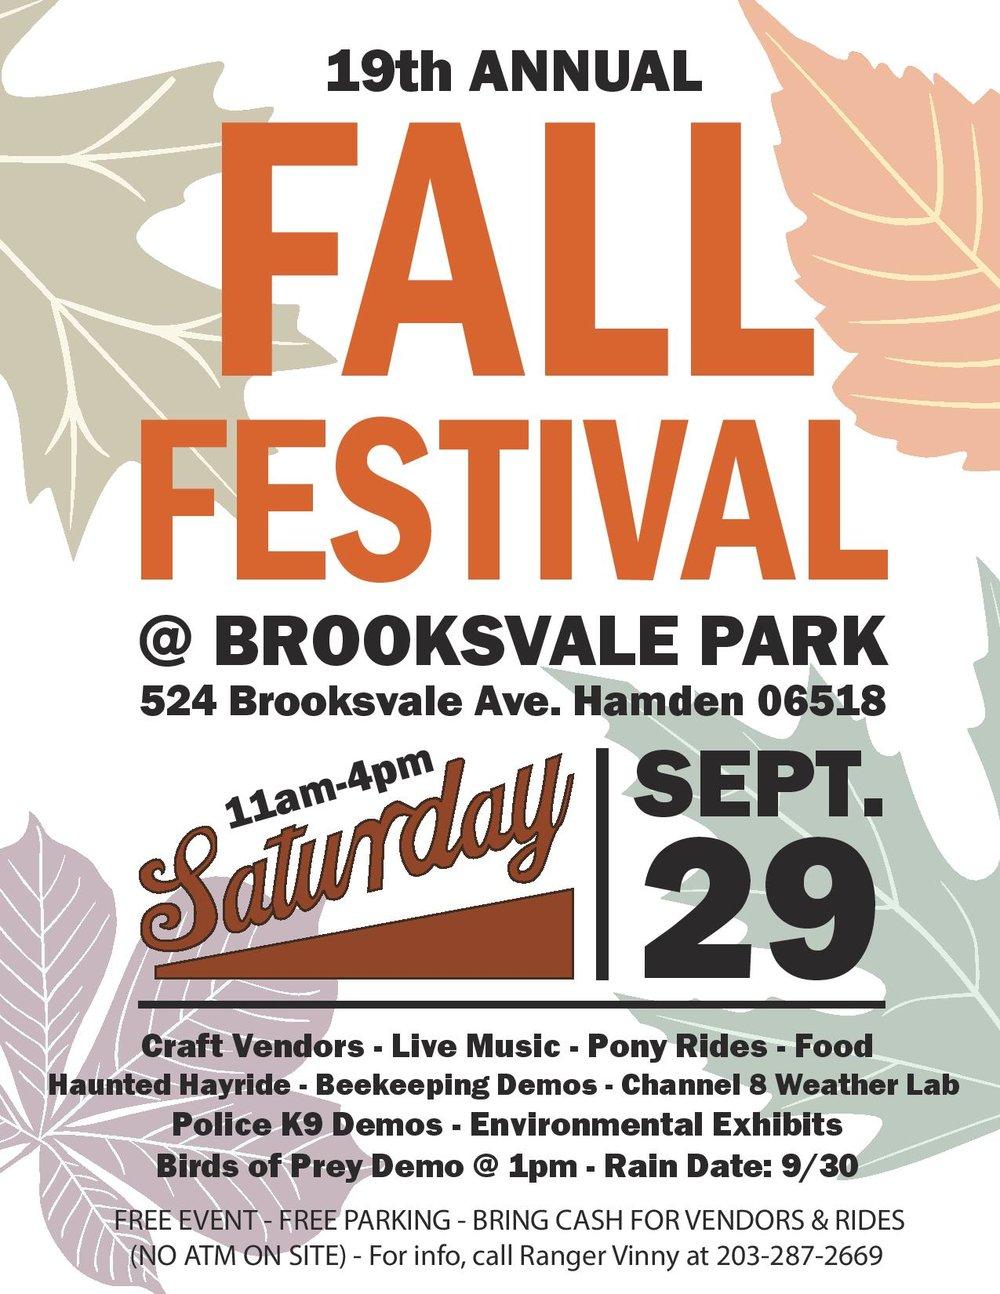 Flyer_Fall Festival_18_P-page-001.jpg